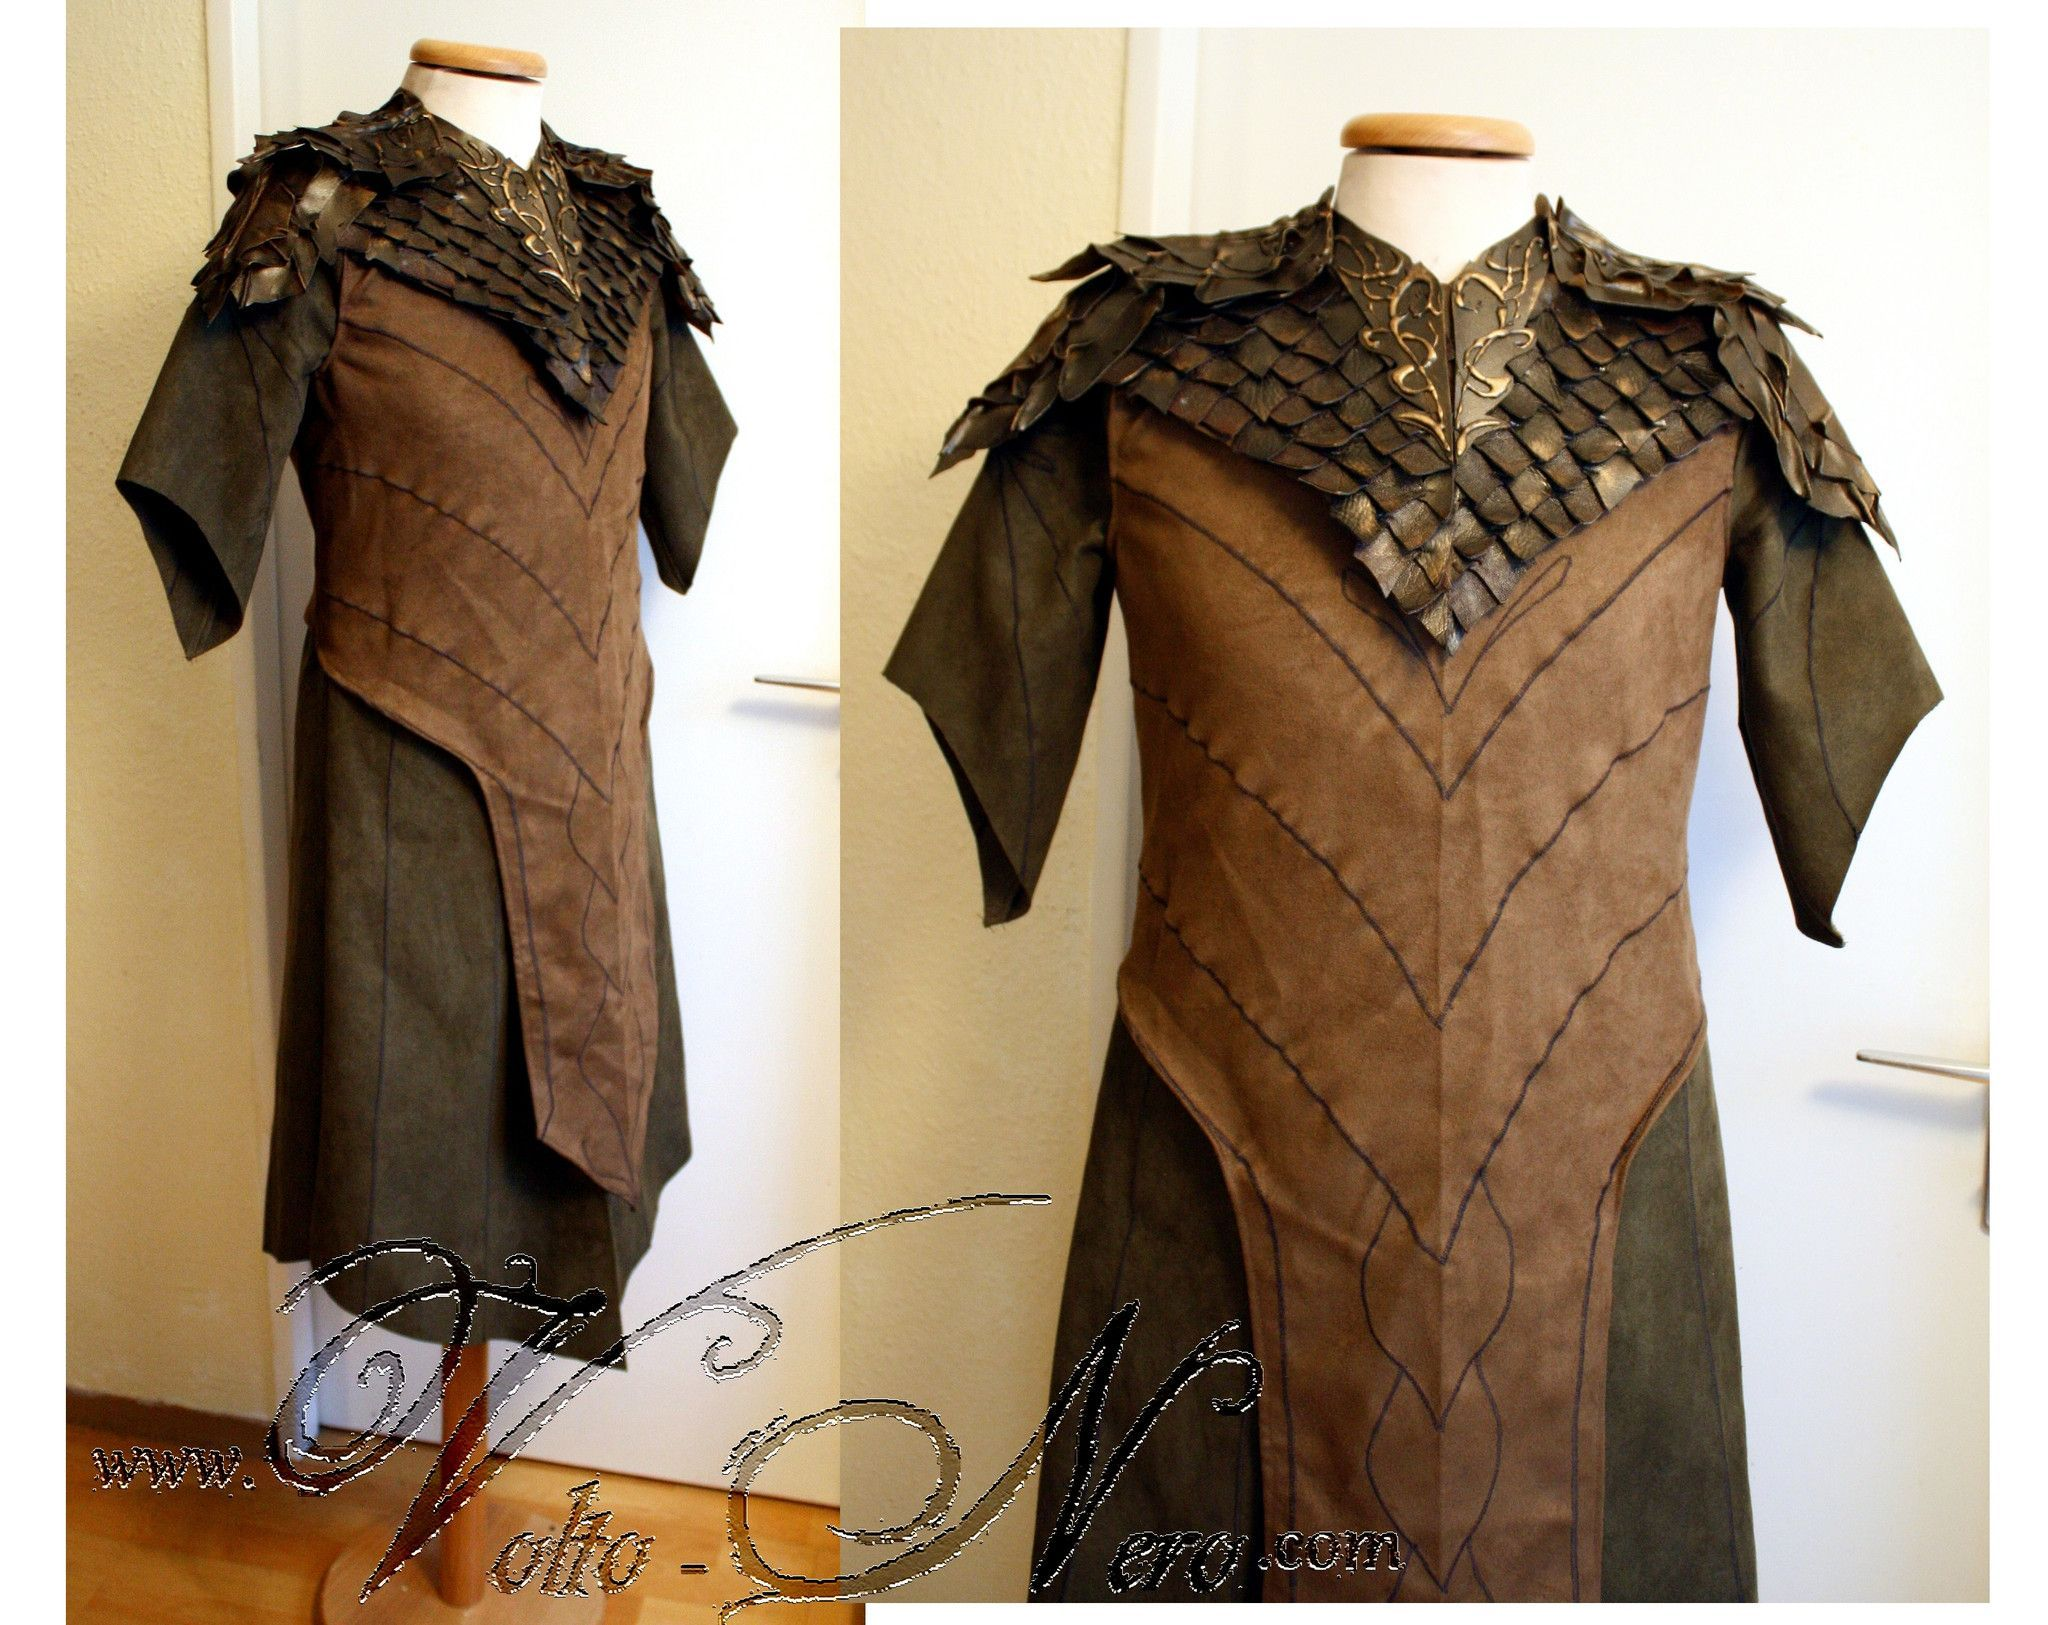 Legolas Armor & Tunic - The Hobbit Elf Costume Lord of the Rings